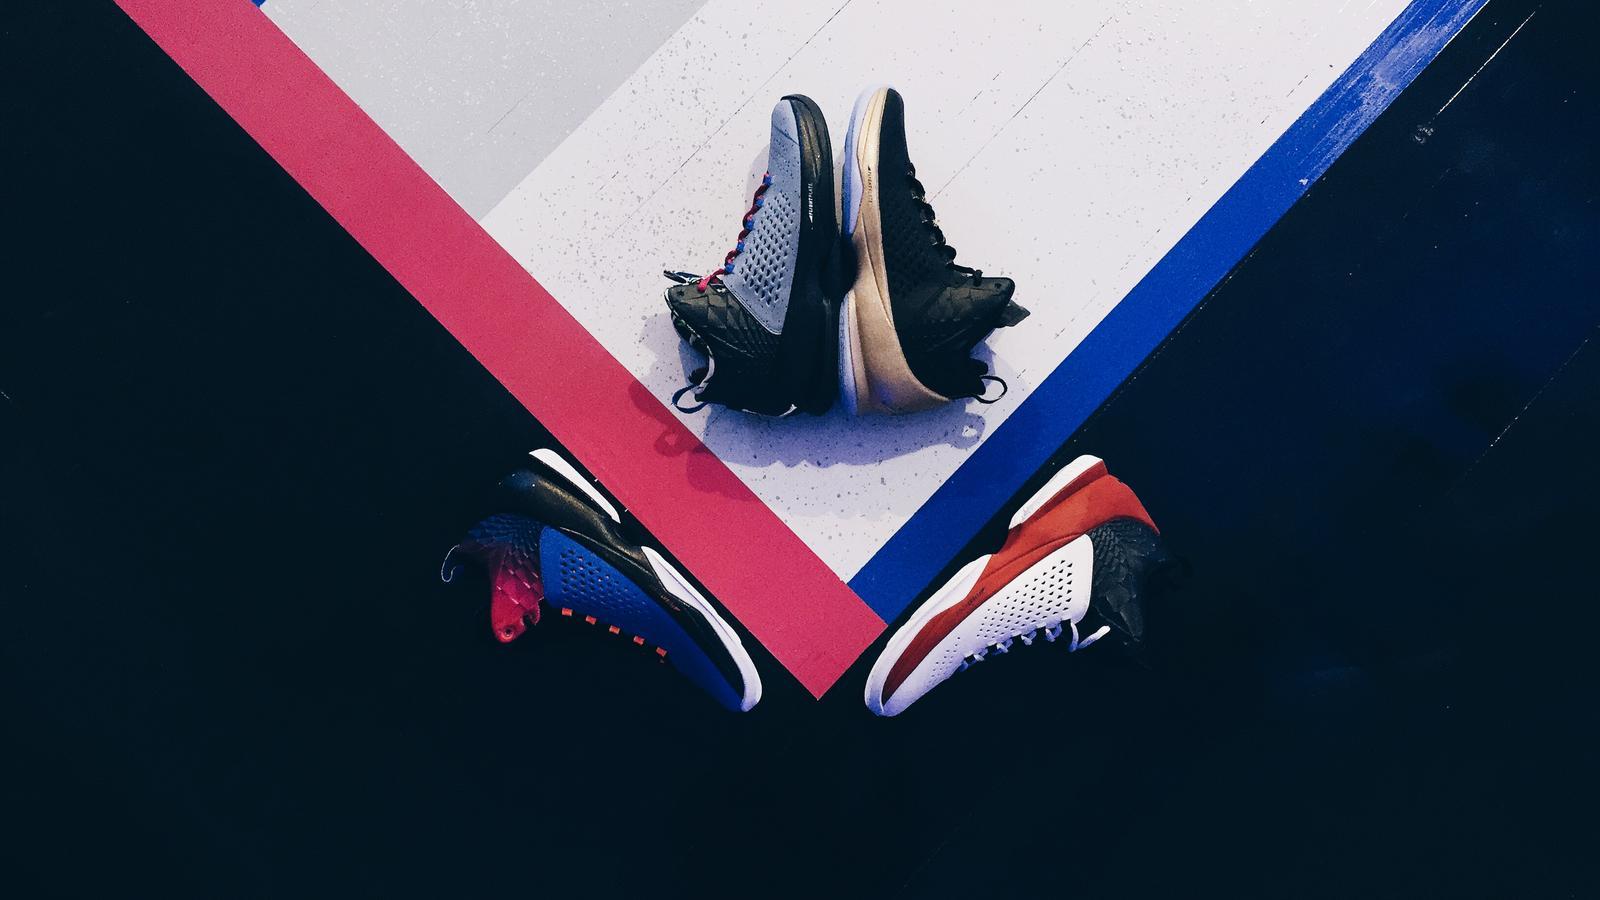 09ada30870ae6b Jordan Brand introduces the Jordan Melo M11 - Nike News